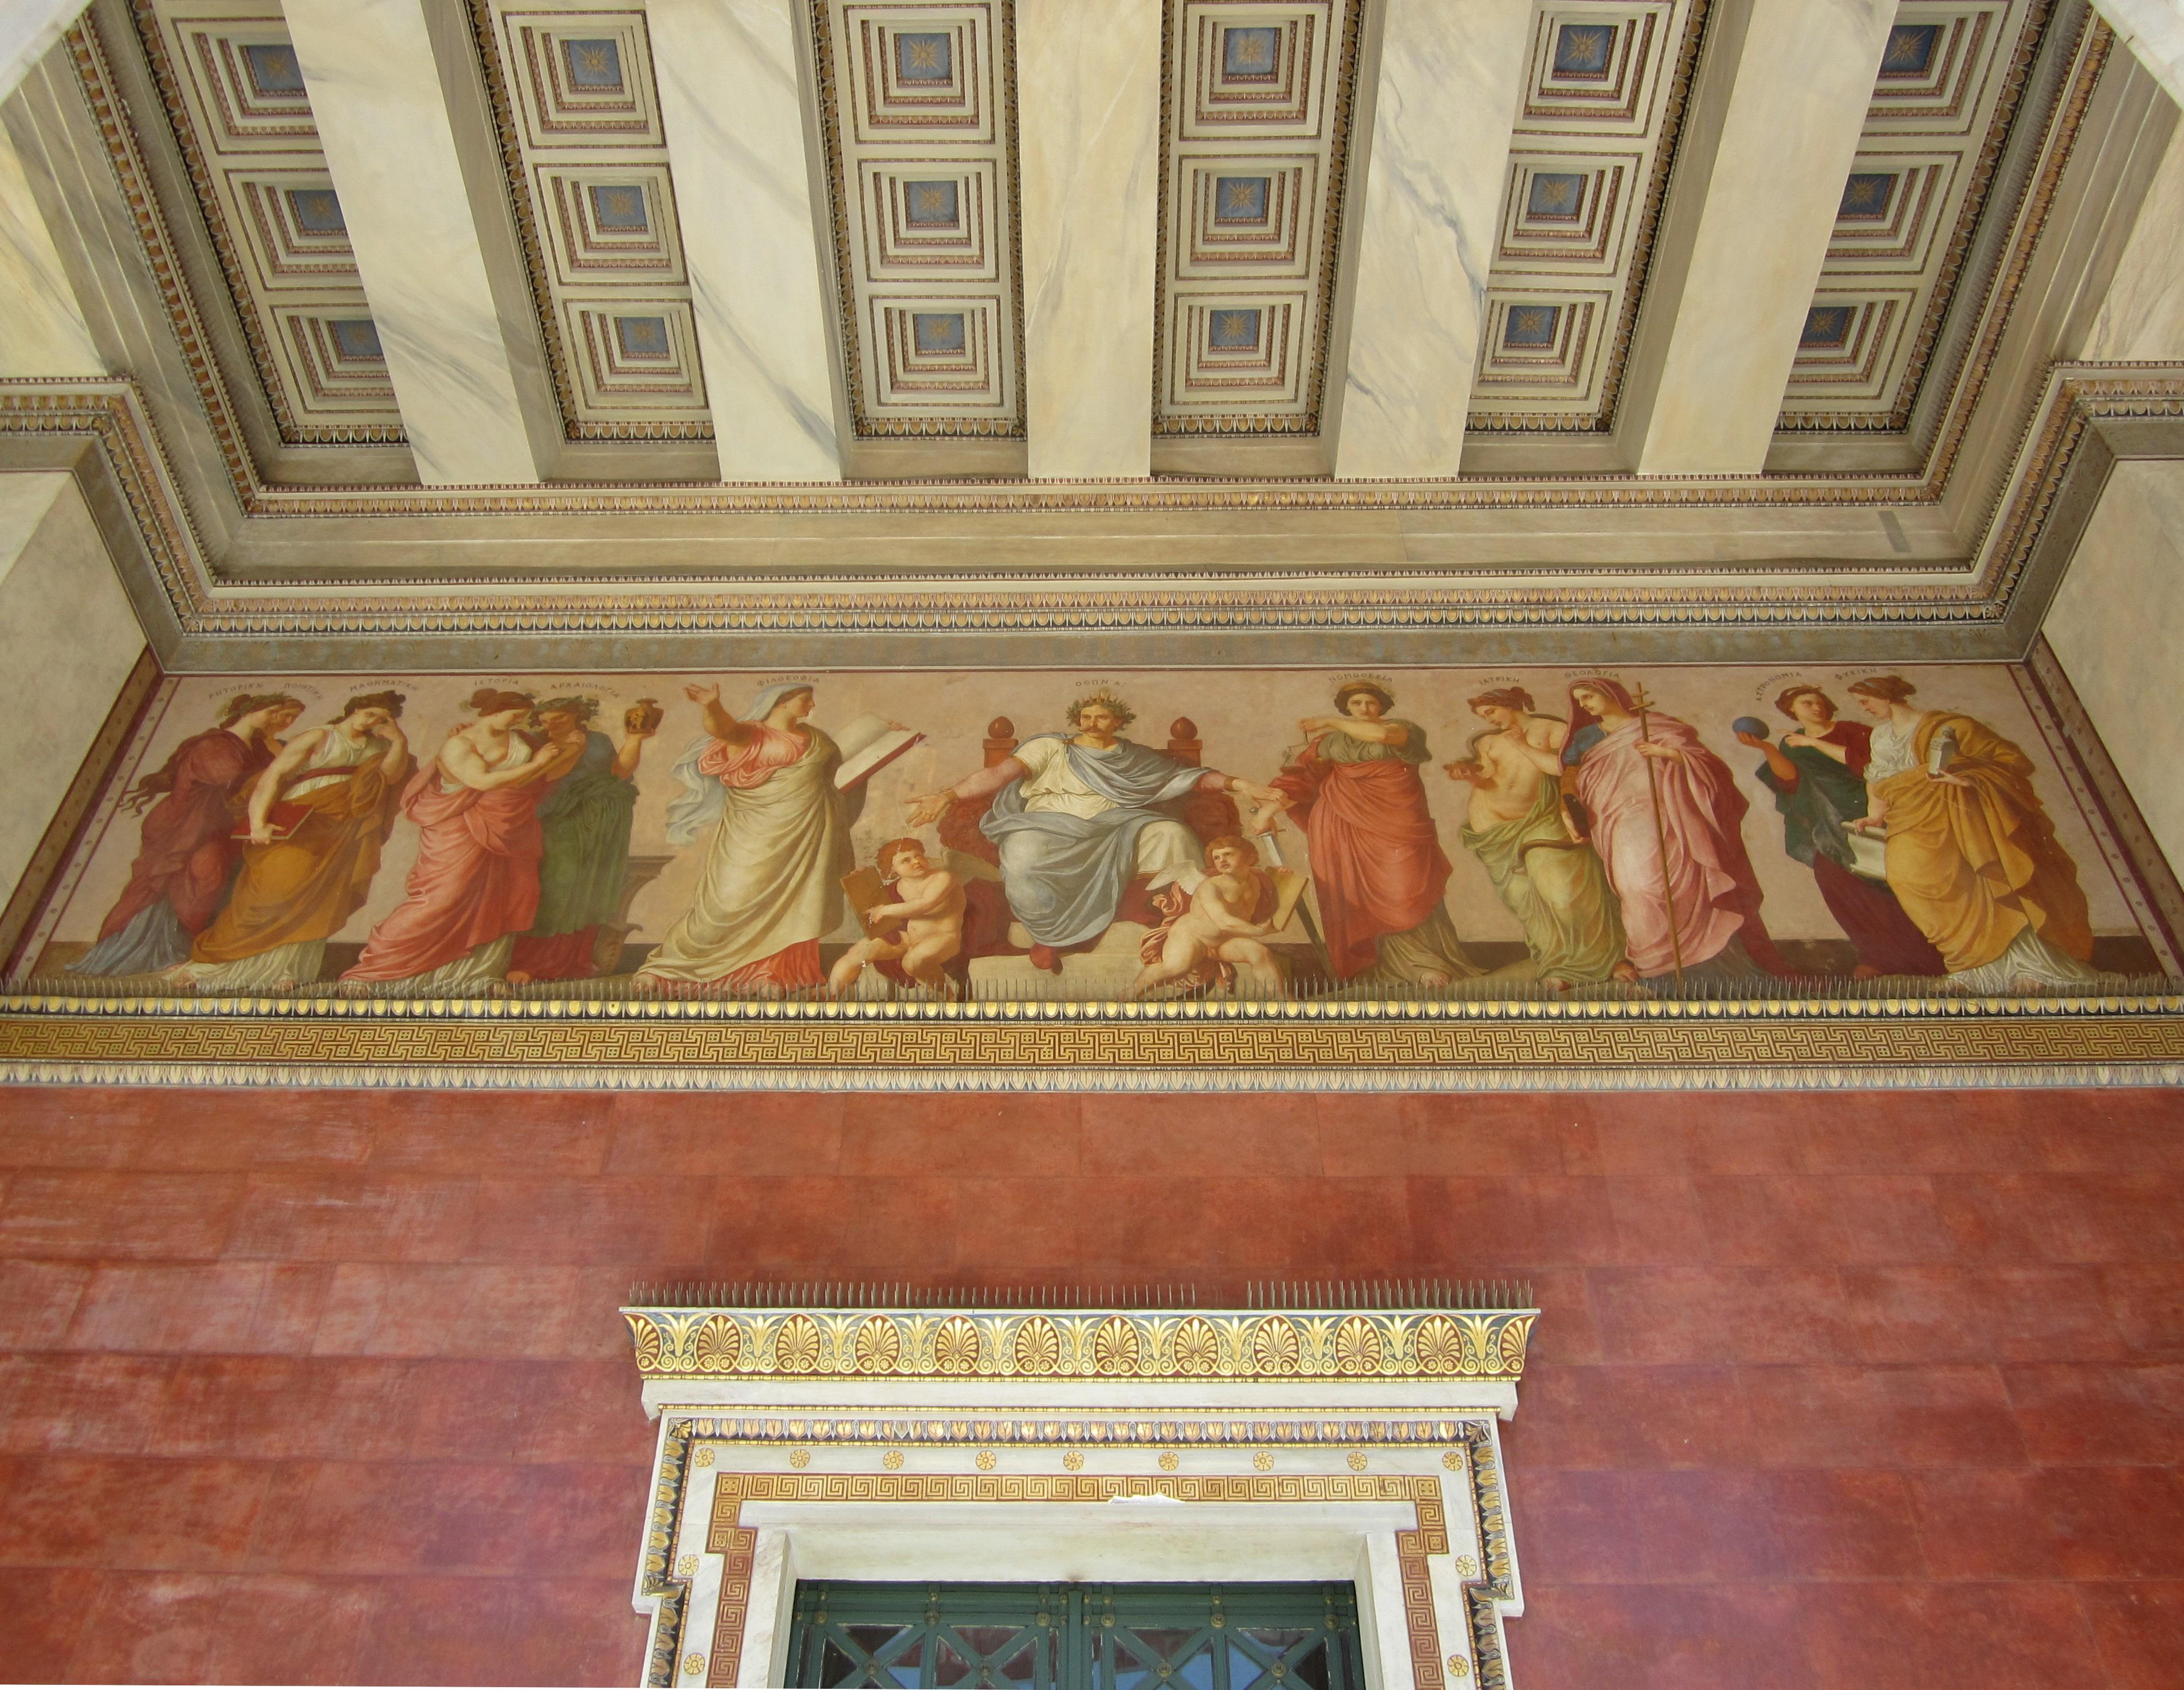 File:University of Athens - Propylaea - fresco.jpg ...